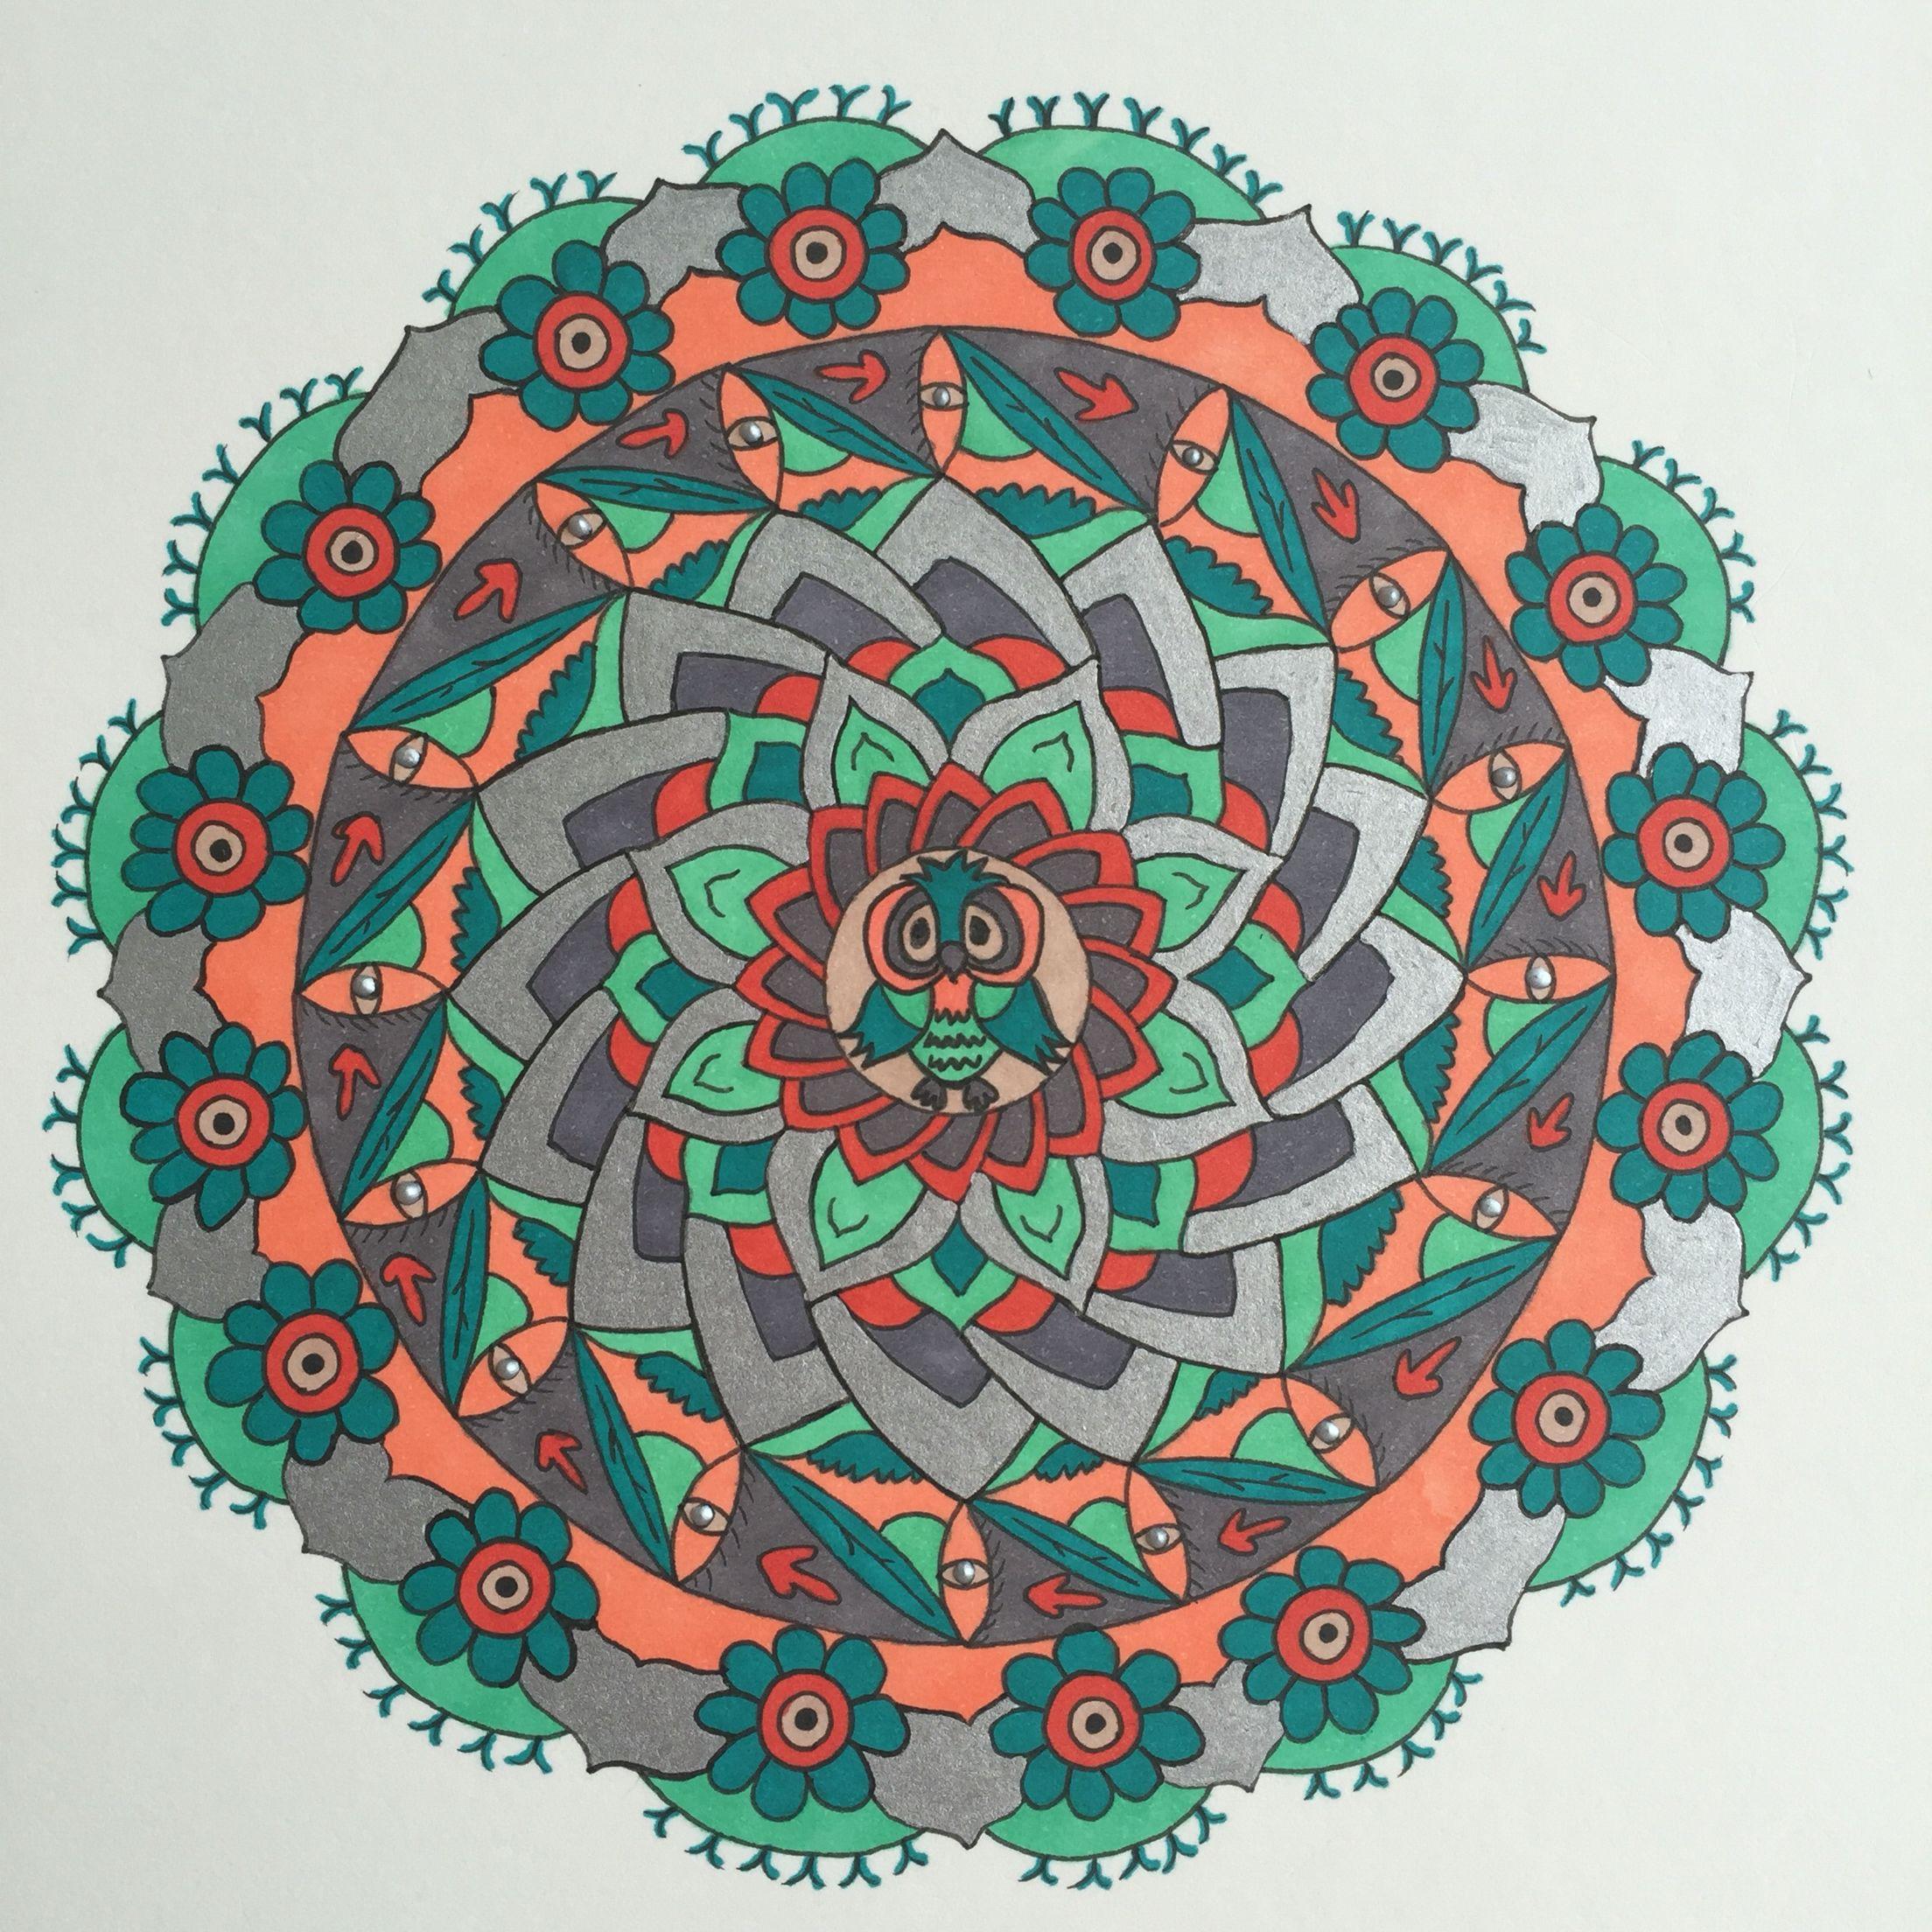 Color art mandala wonders - Wisdom Burgeoning Into Happiness Mandala In Color Wisdom Knowledge Wonder Joy